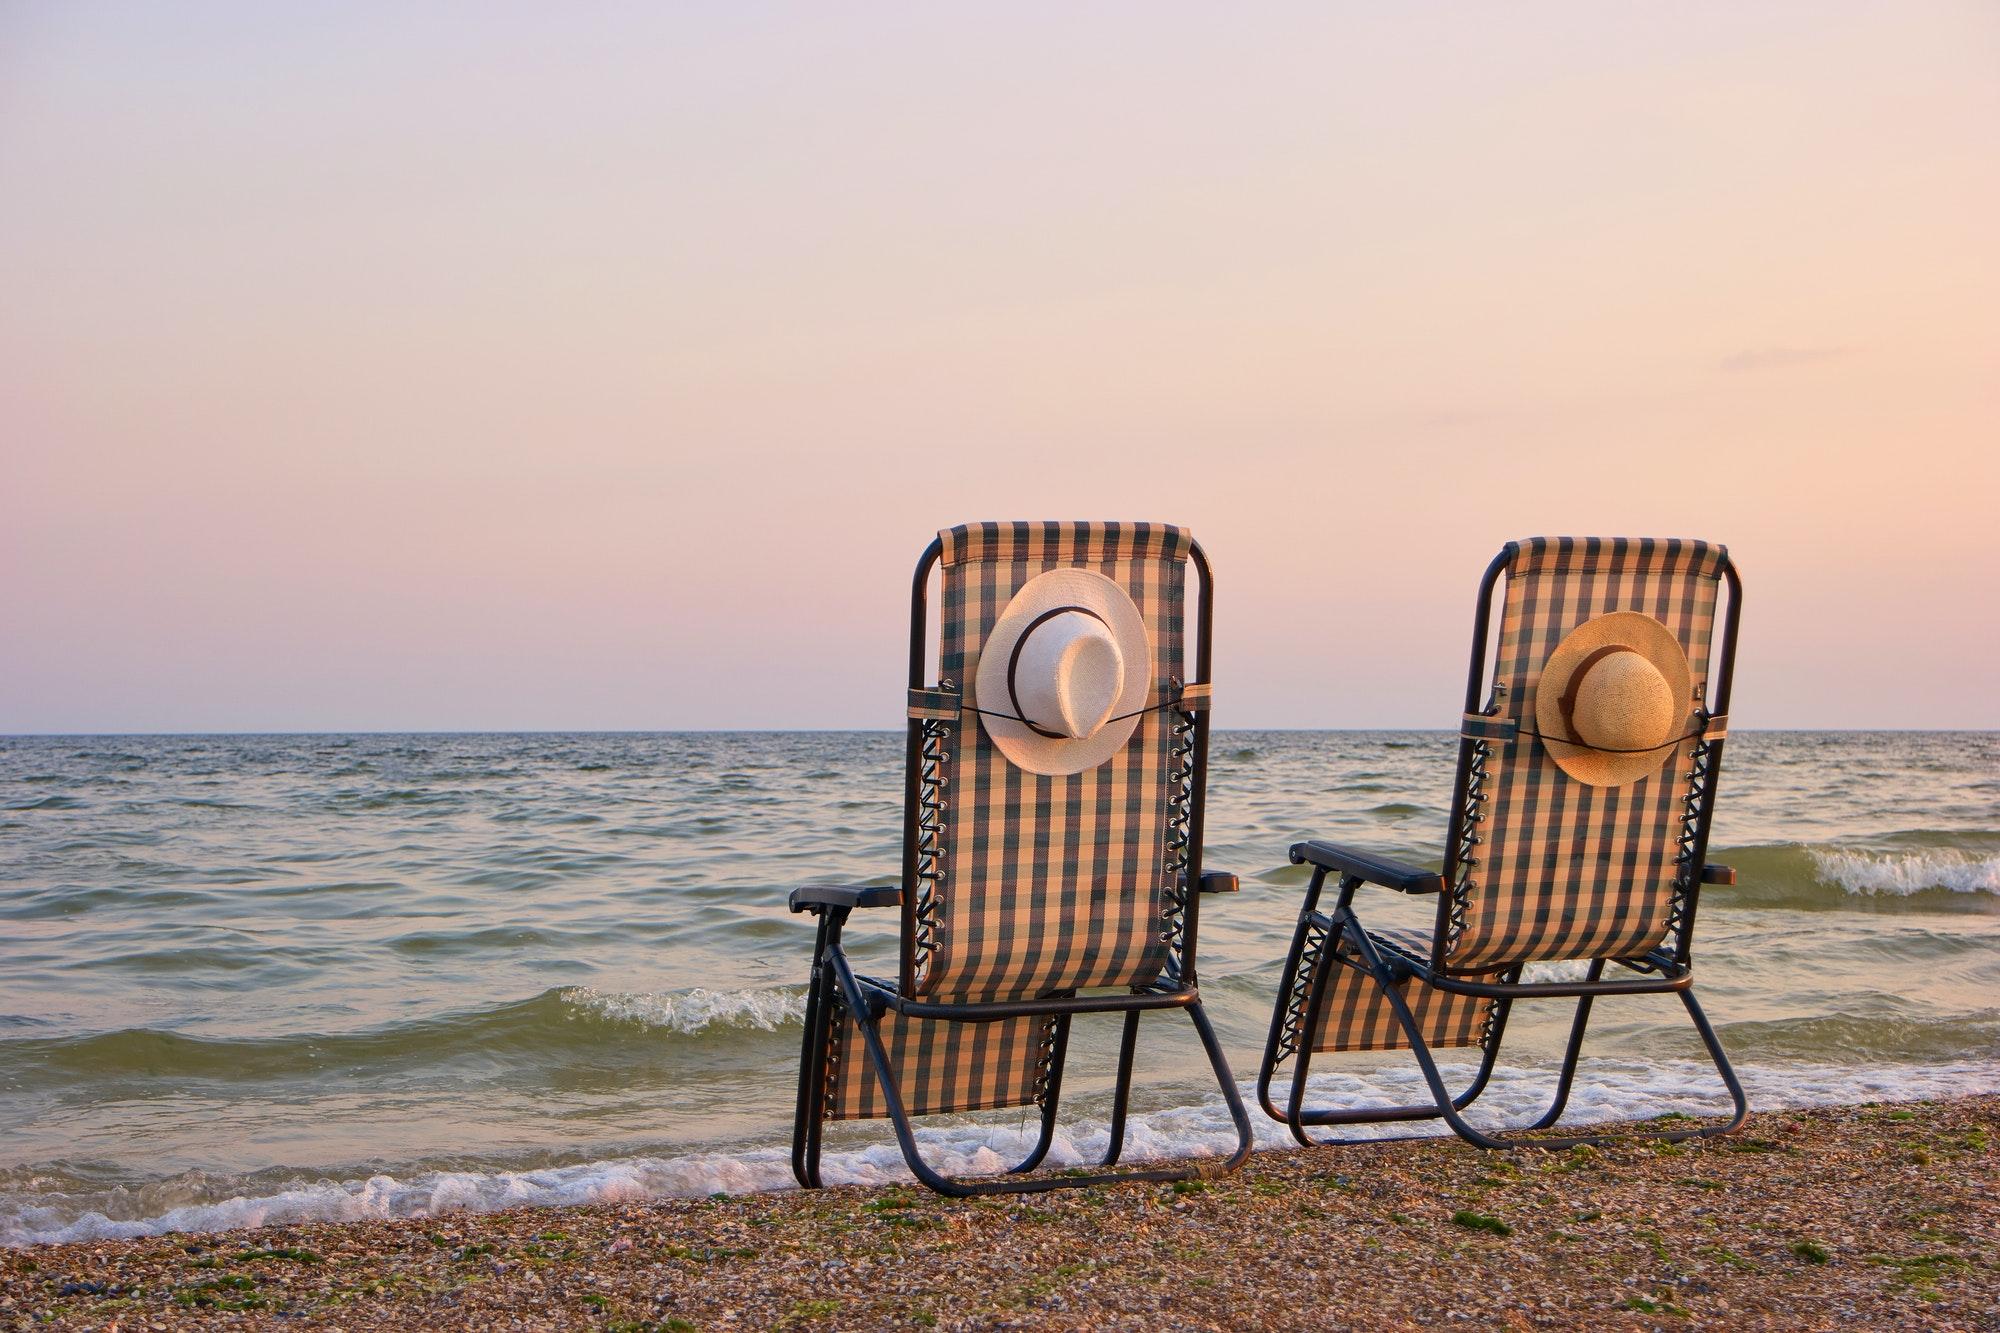 Deck chairs on a beach.